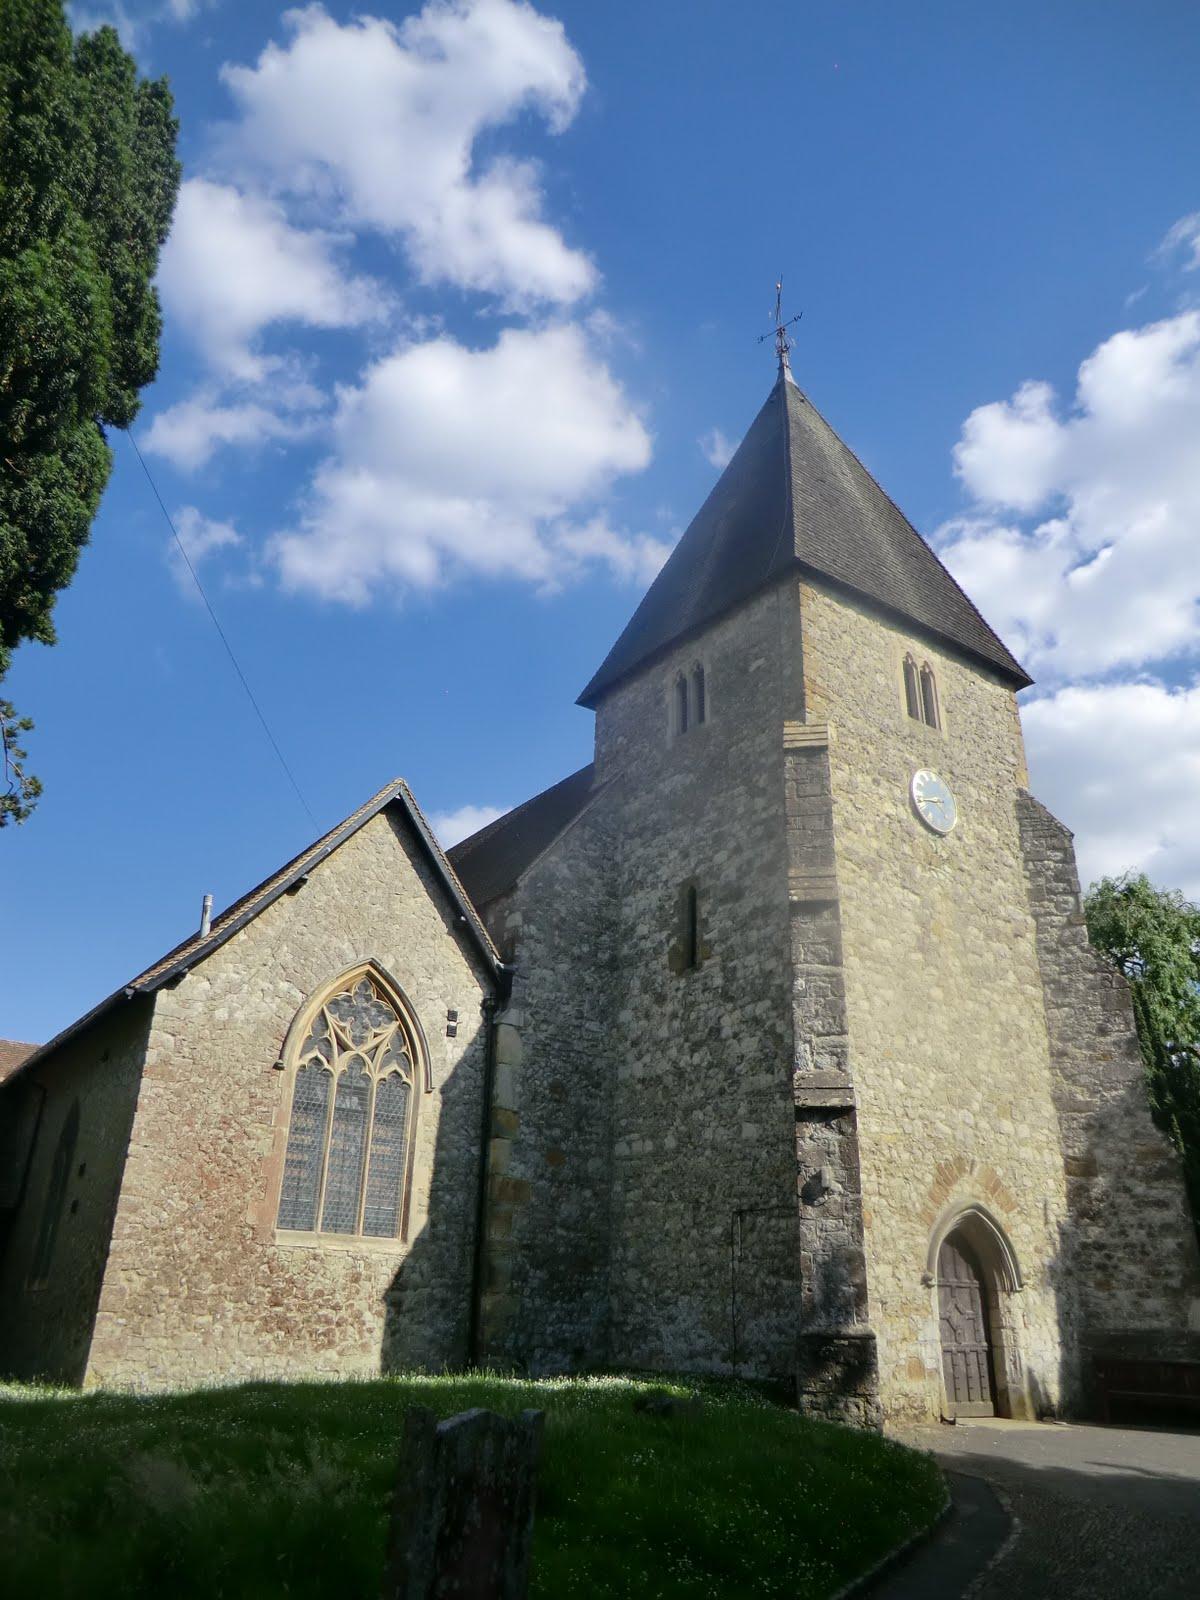 CIMG2004 St Mary's church, Hadlow